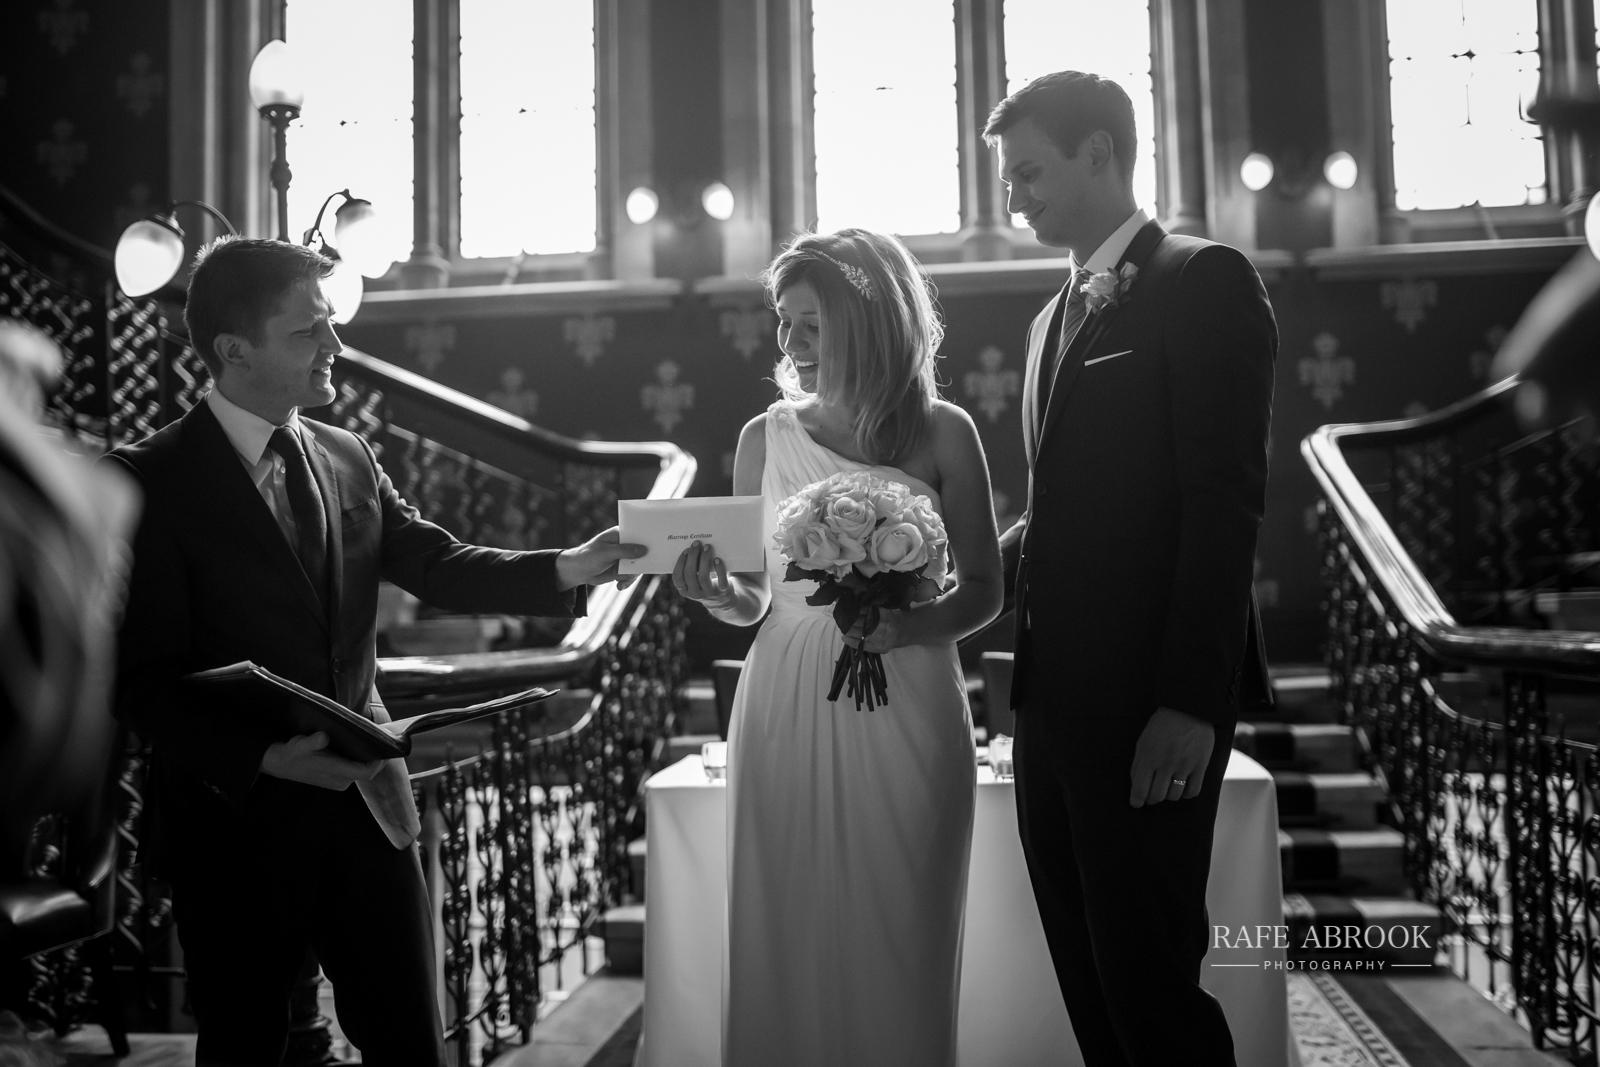 wedding photographer hertfordshire london st pancras renaissance hotel station grand staircase-1104.jpg